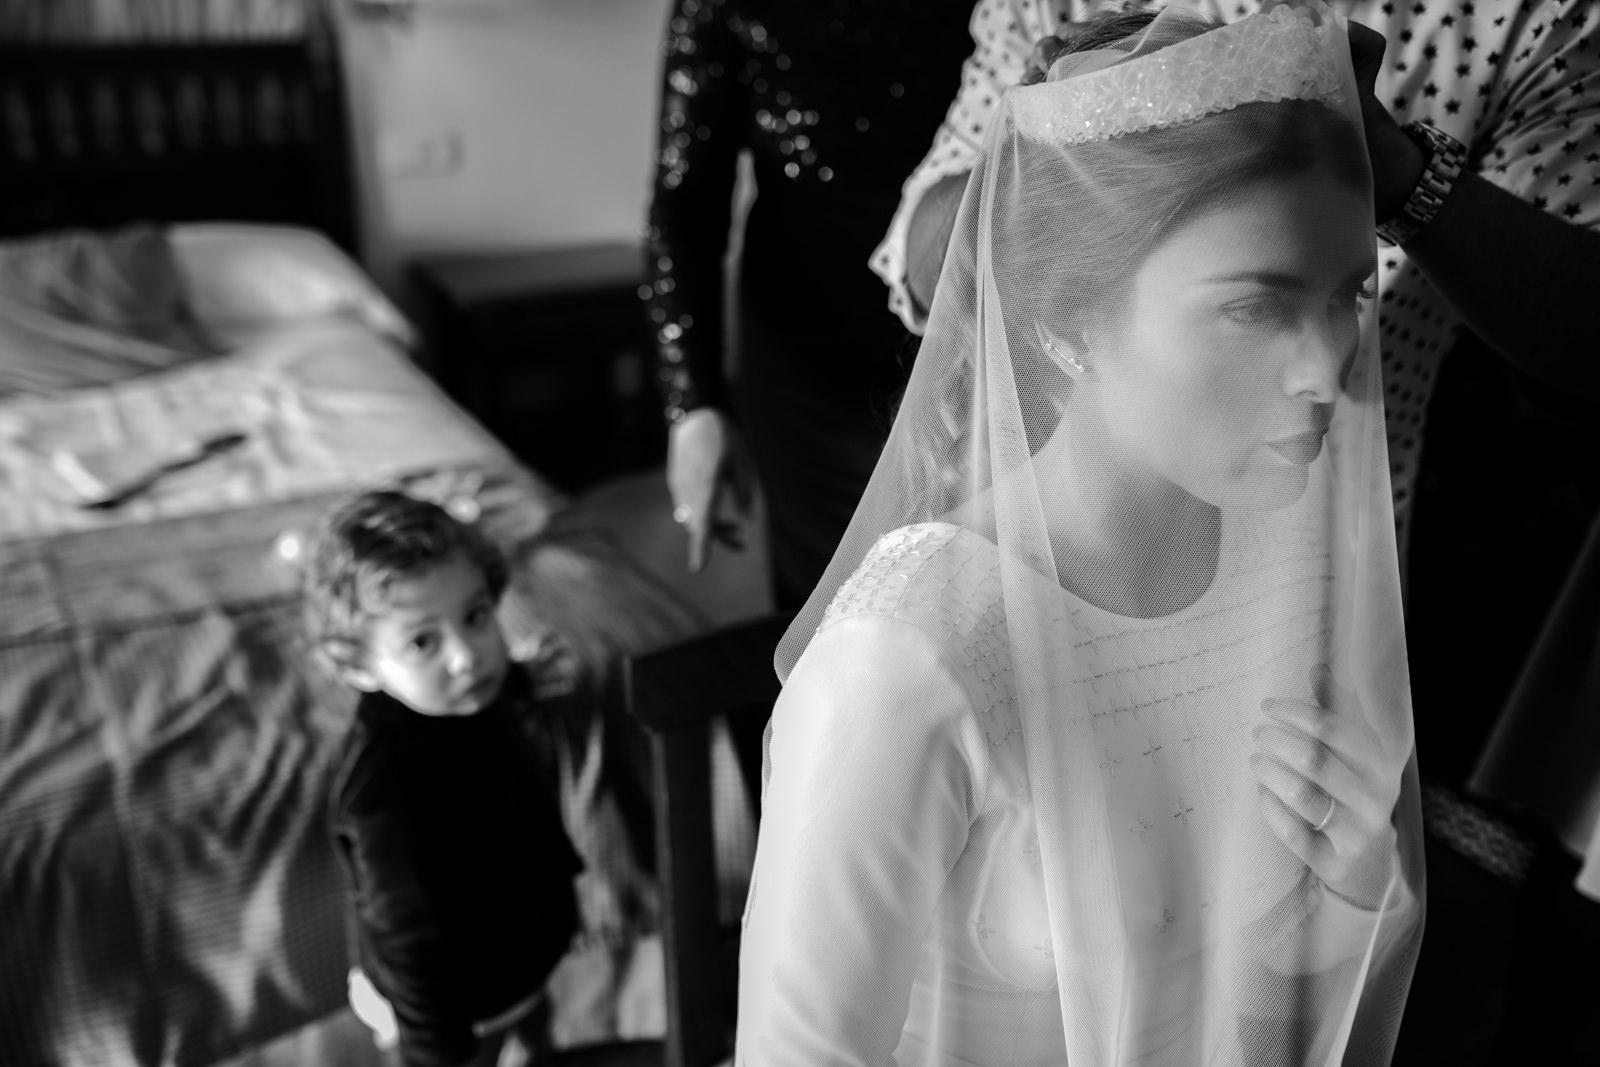 Wedroads-Boda-Sevilla-Parador-Carmona-bridal-engagement-Rafael-Torres-fotografo-bodas-sevilla-madrid-barcelona-wedding-photographer--24.jpg